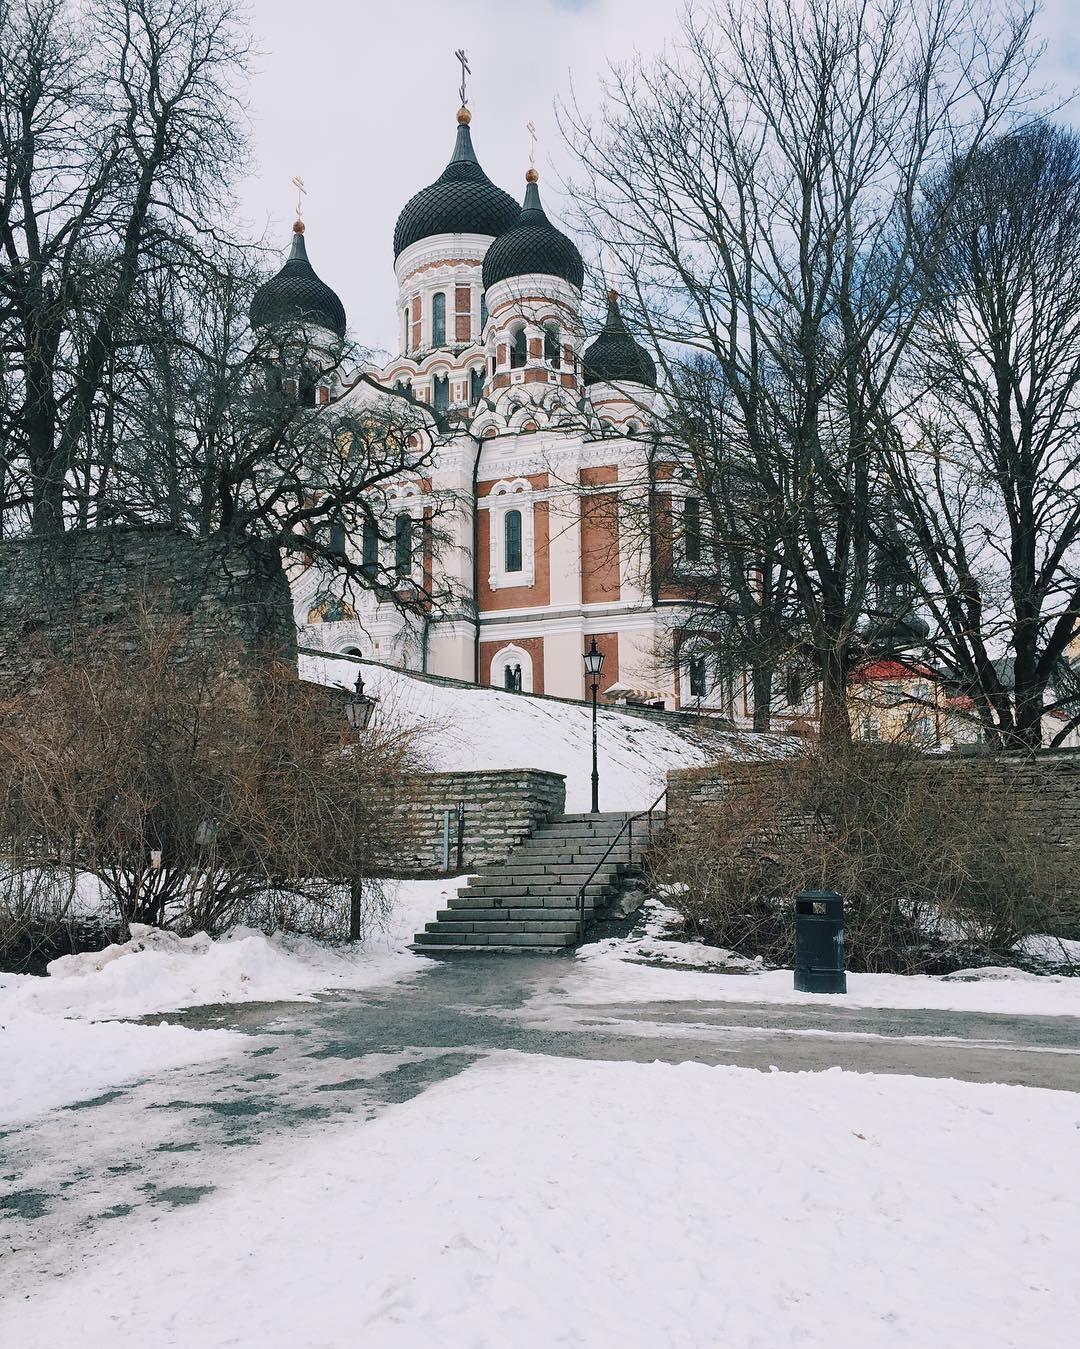 #Tallinn #tallinna #tallinngram #visitestonia #latergram #travelgram #travel #estonia